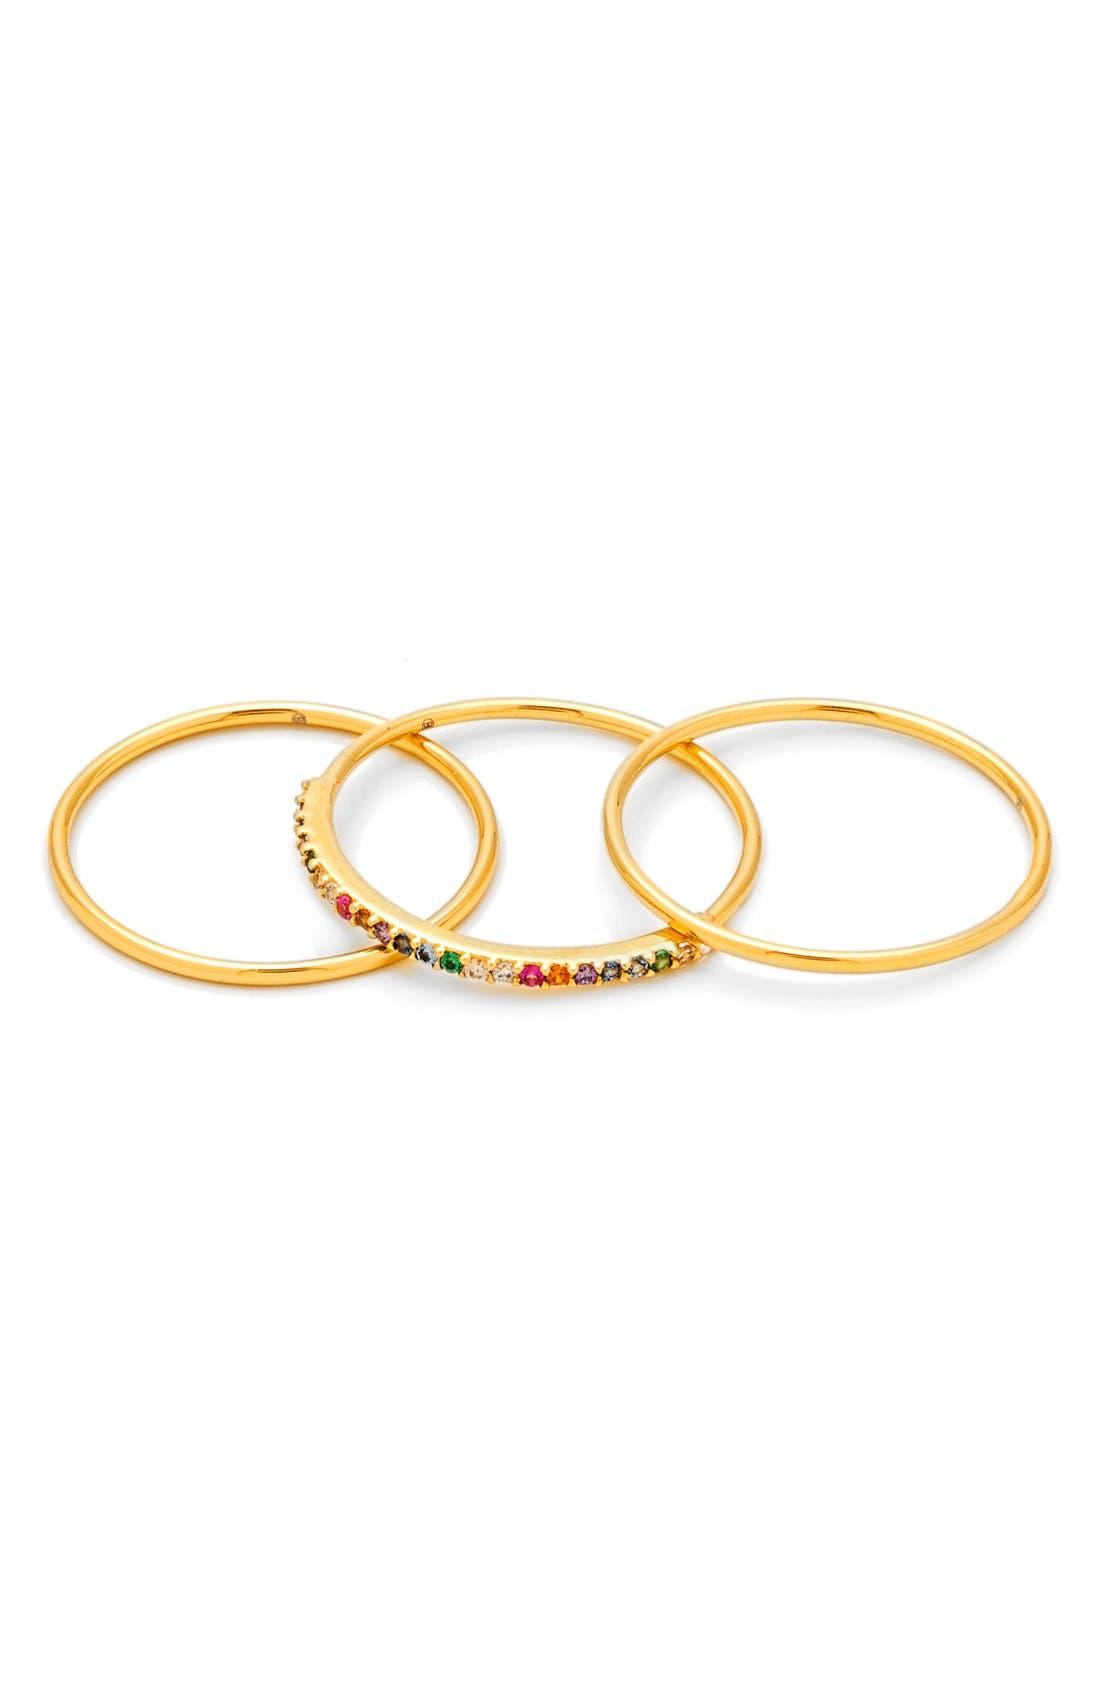 Alternate Image 1 Selected - gorjana Shimmer Stackable Set of 3 Band Rings